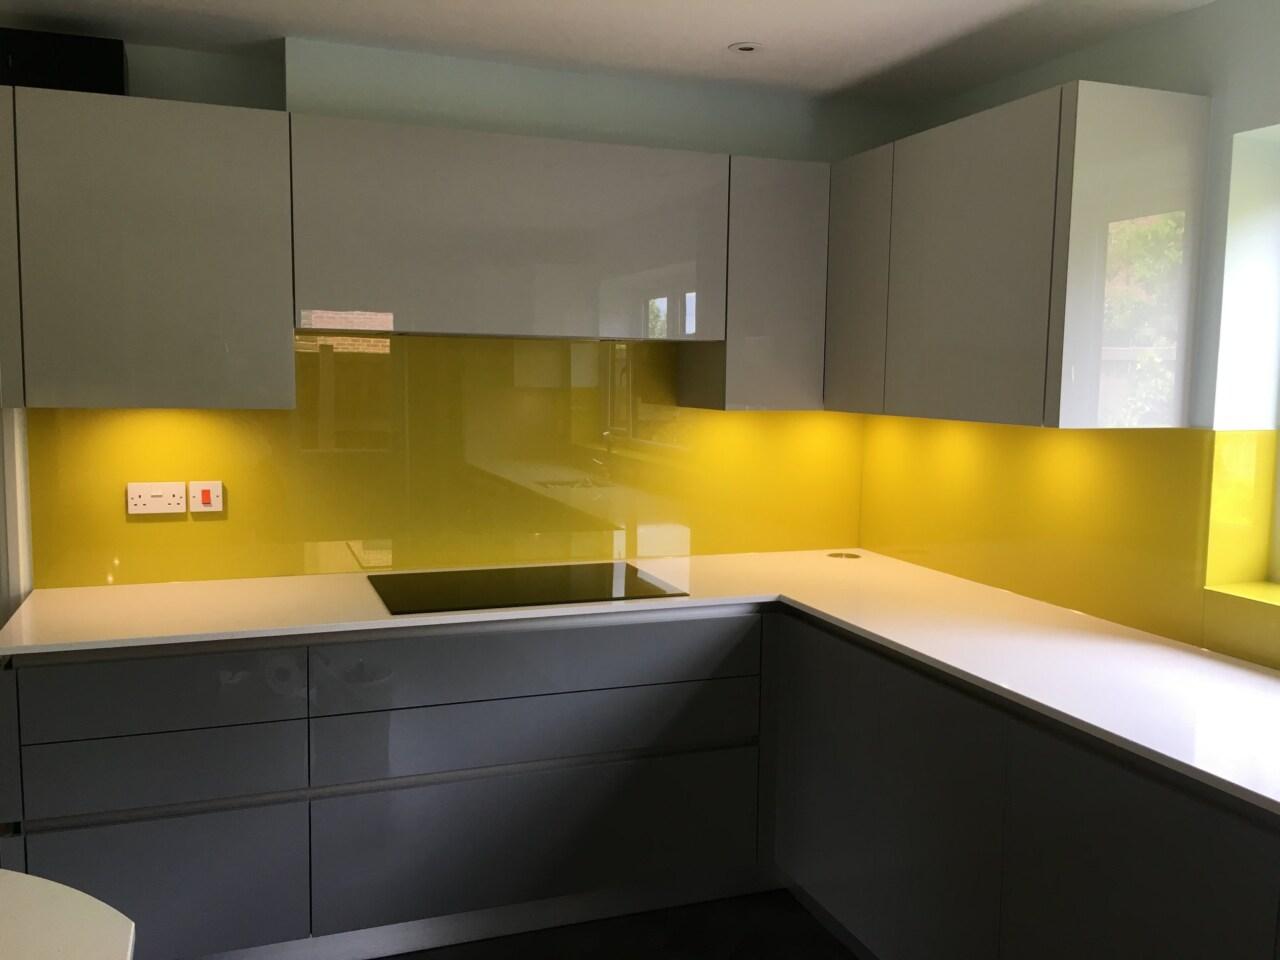 Glass Kitchen Backsplash | A Unique Look for Your Home - UA